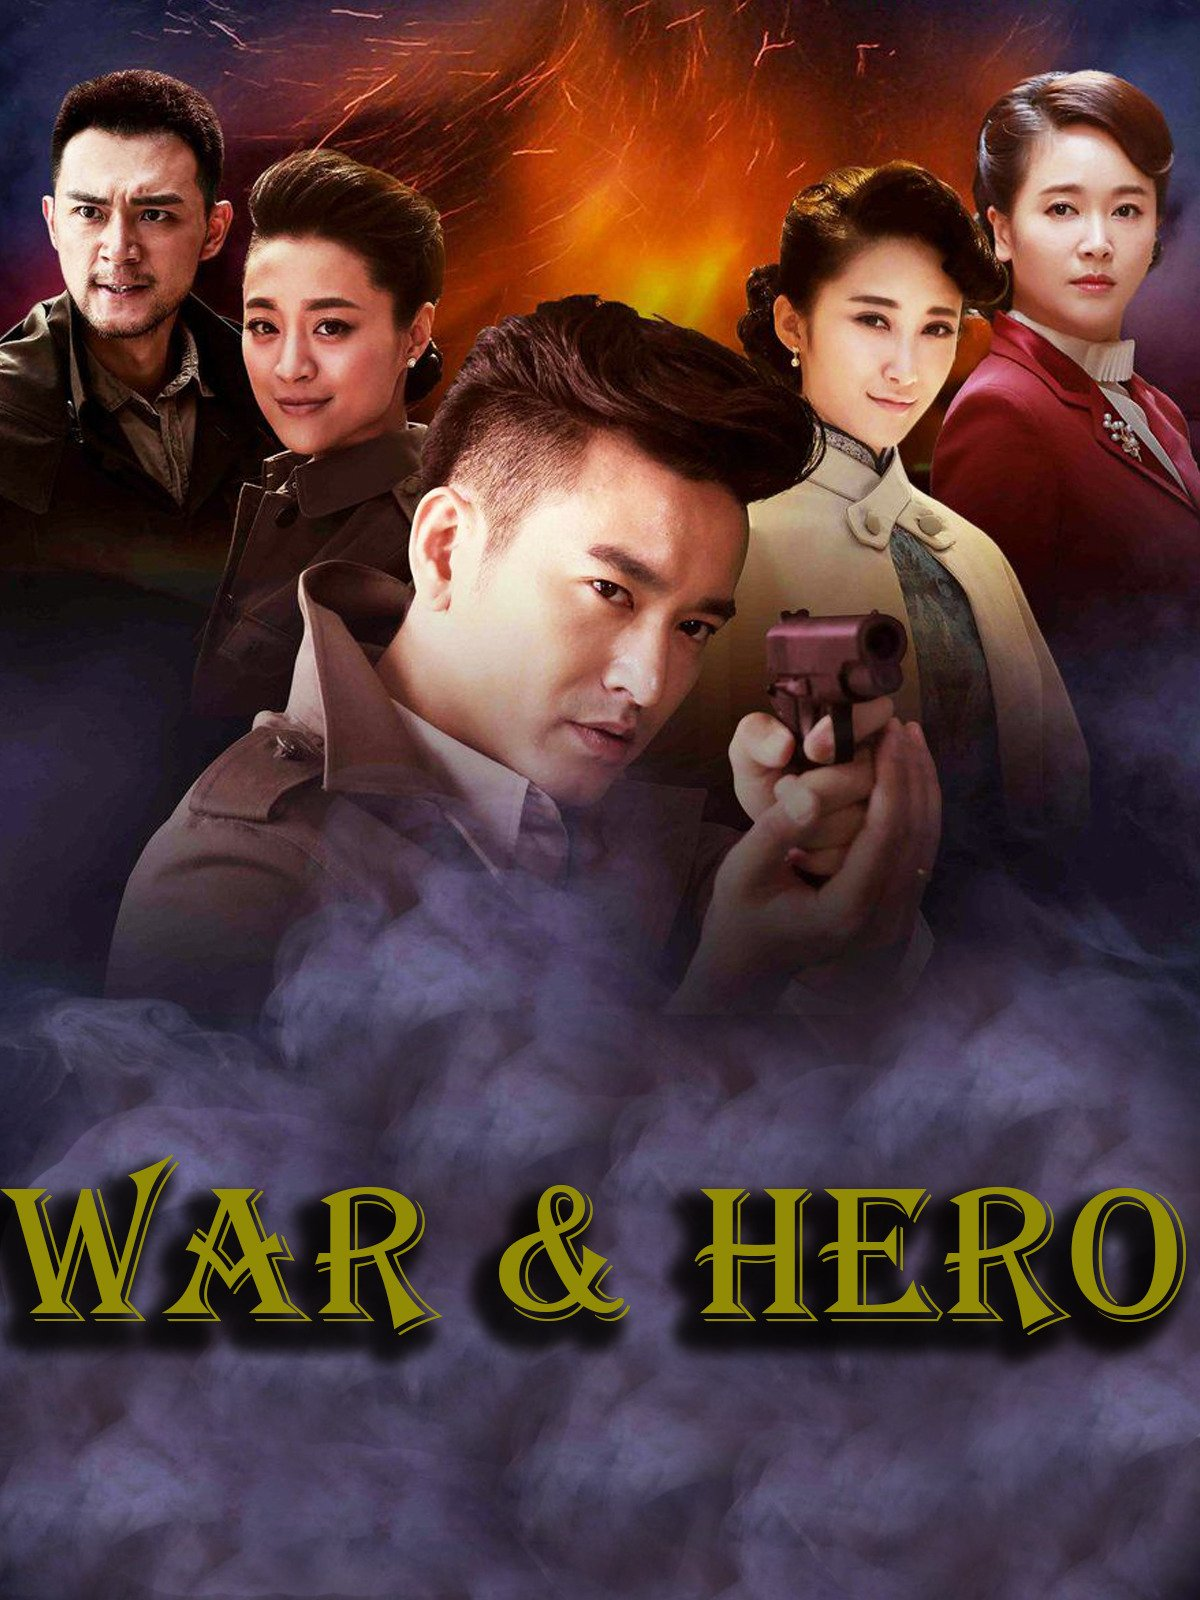 War & Hero